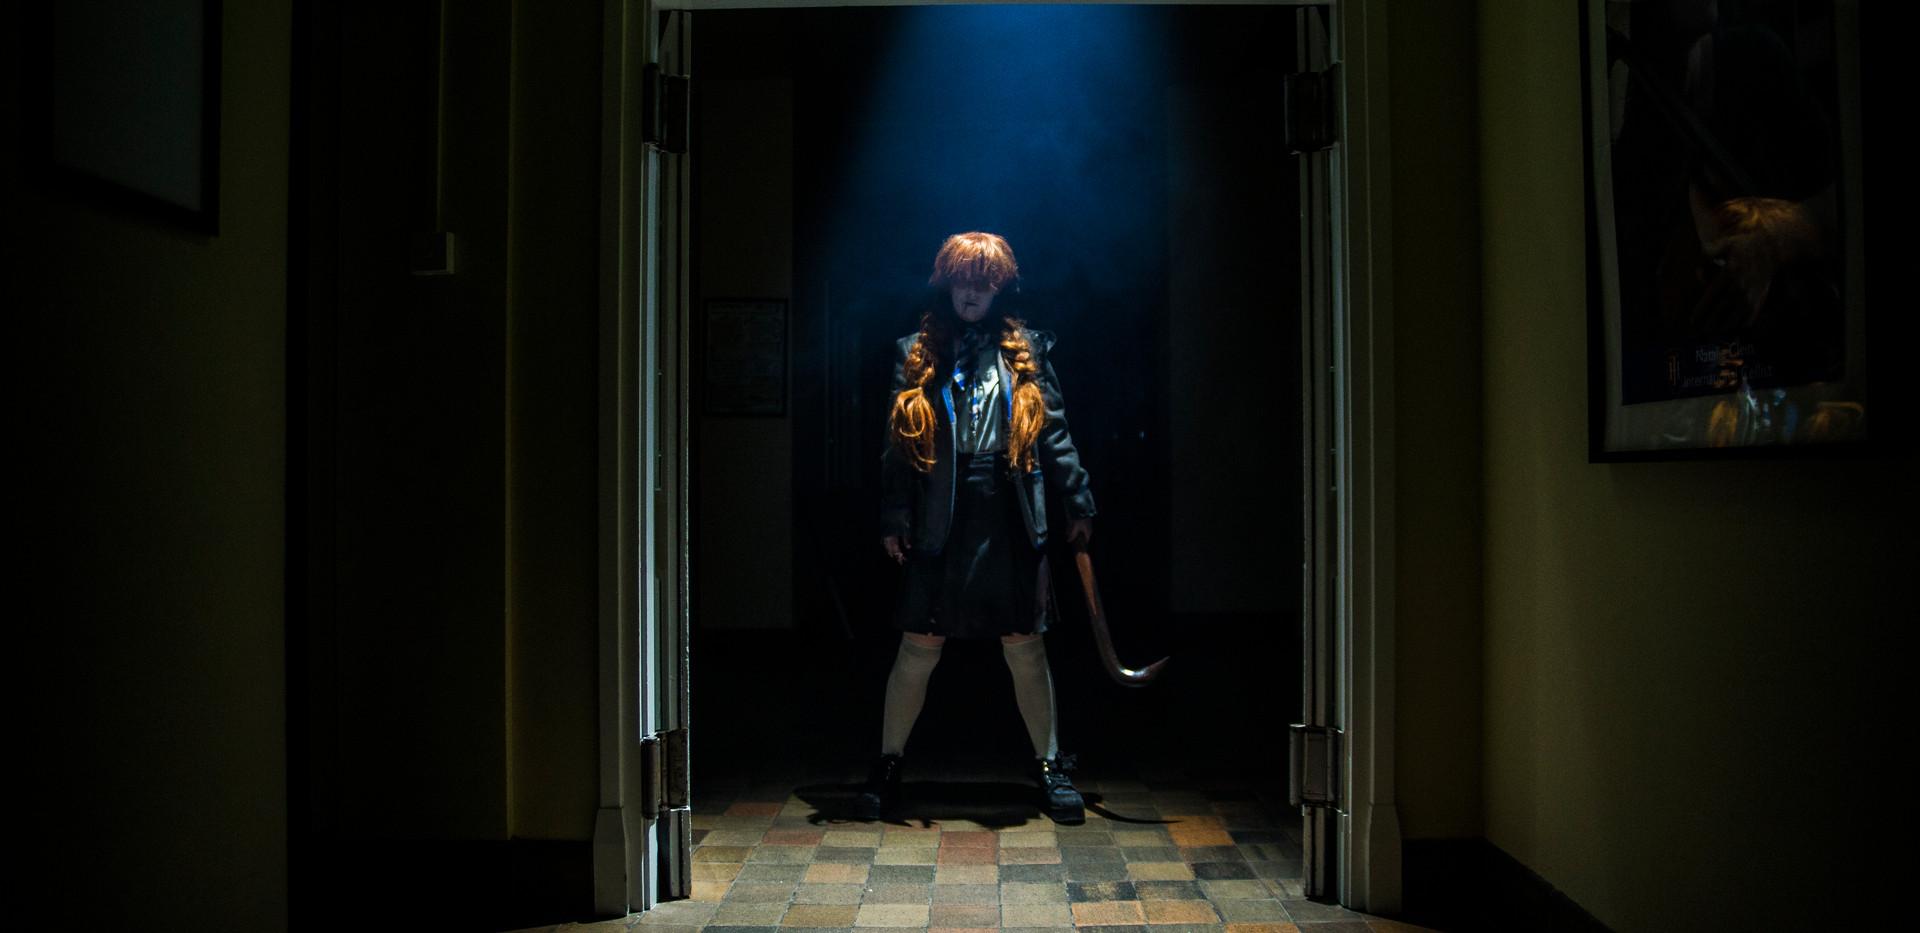 Shelley in light hallway.jpg